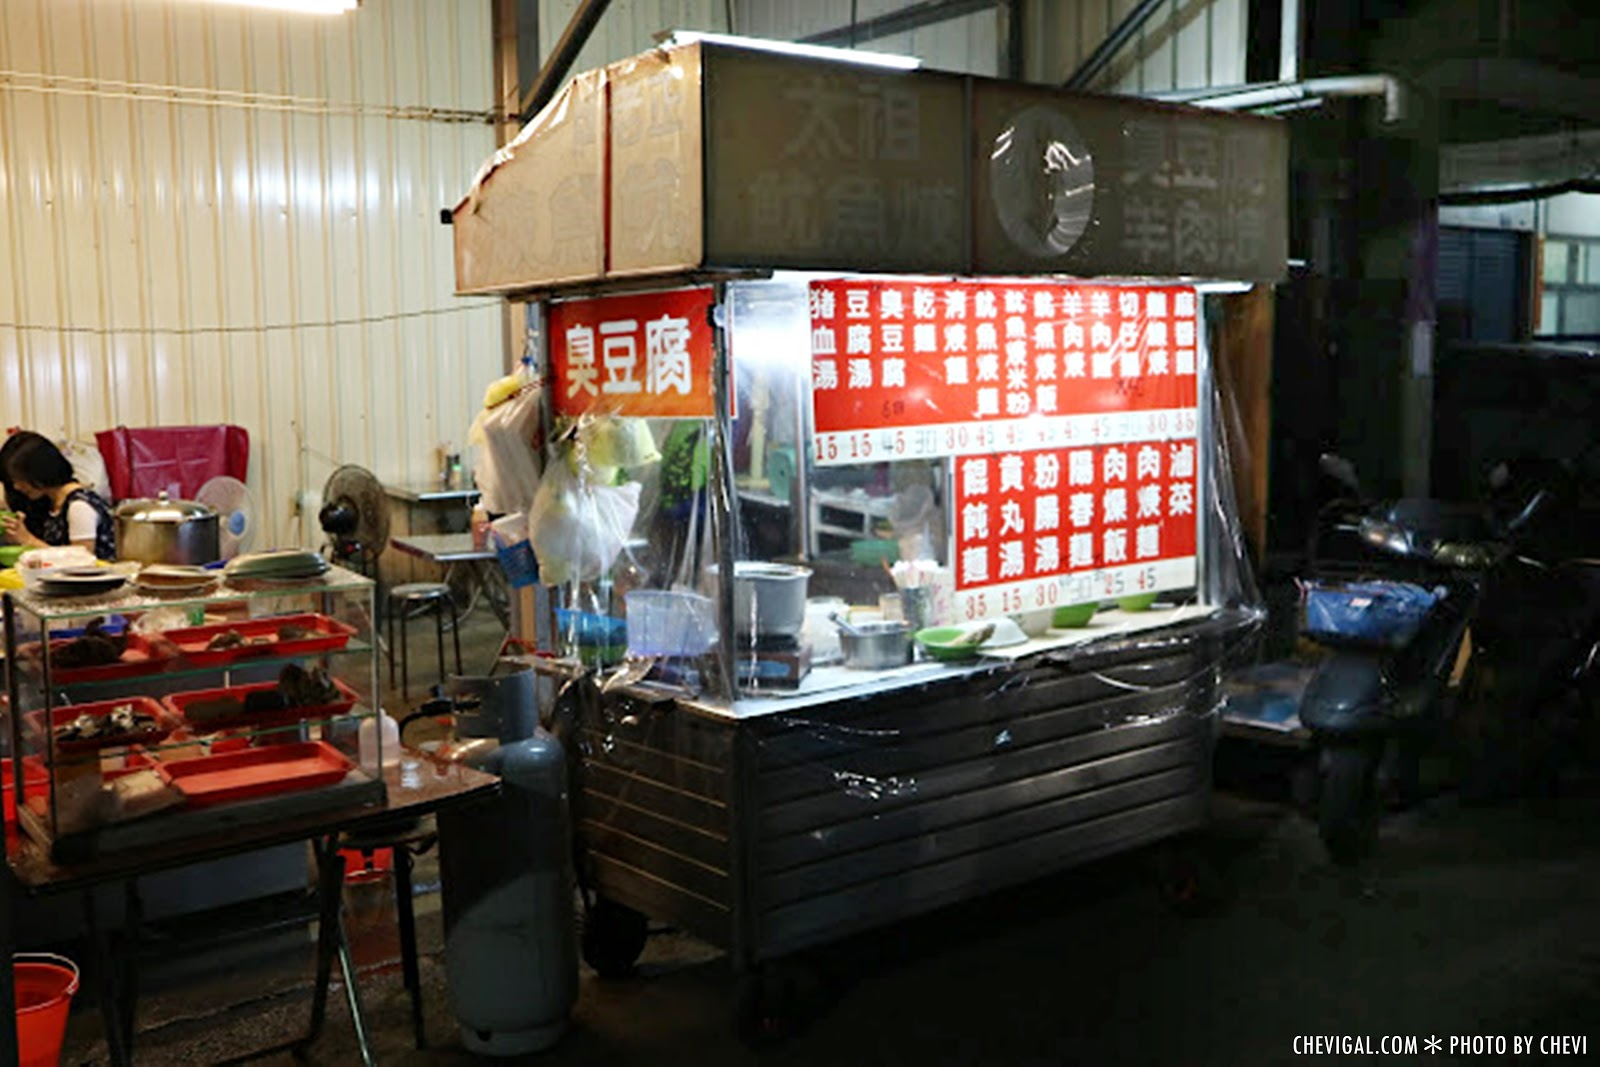 IMG 0645 - 台中烏日│正老牌太祖魷魚羹。隱藏多時的在地美味。臭豆腐終於強勢回歸啦!